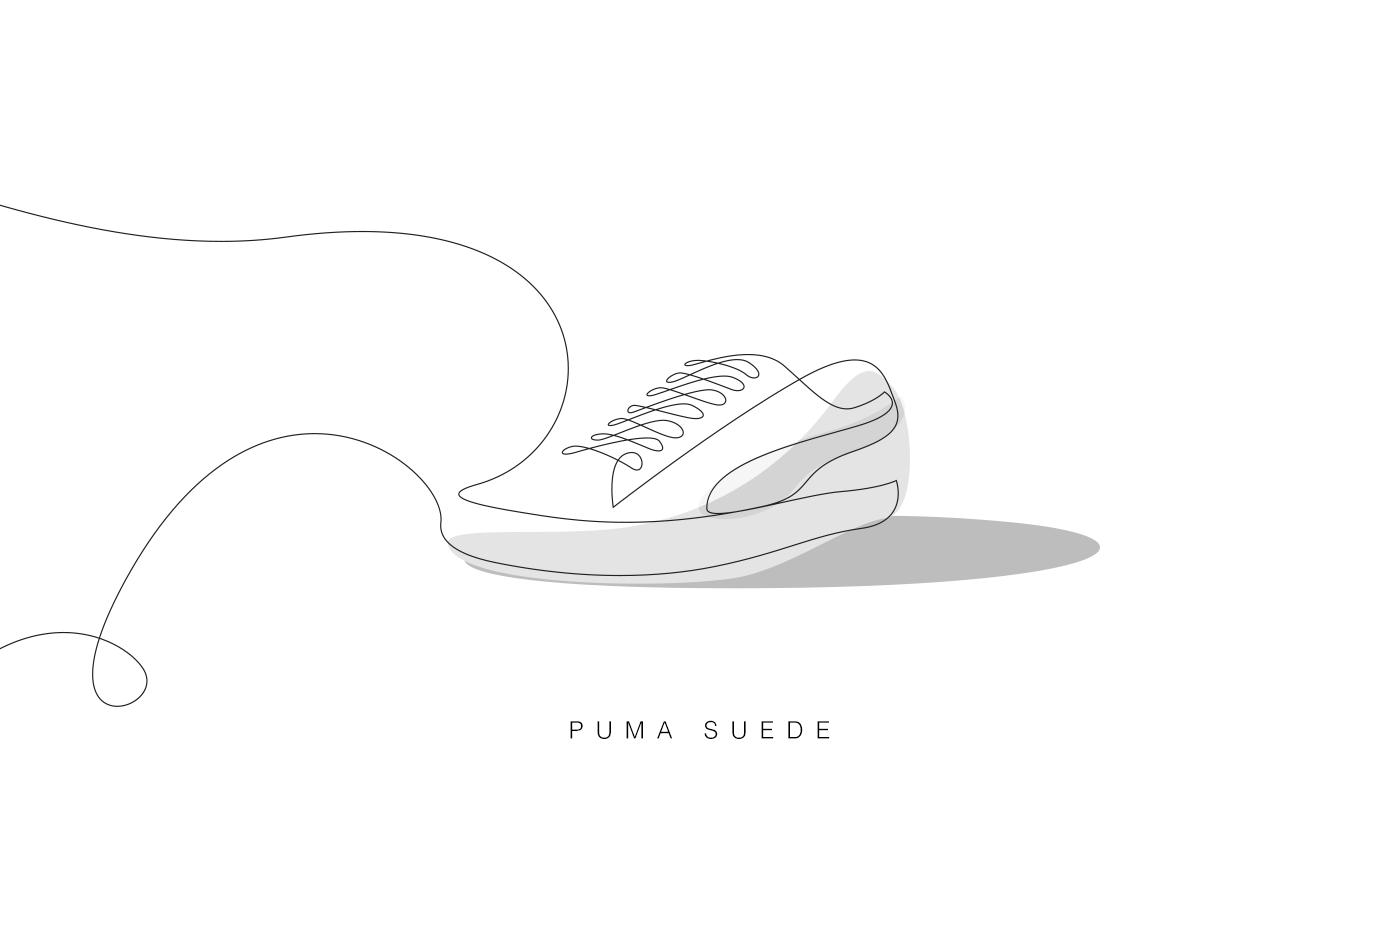 Differantly Studios One Line Sneaker Drawings